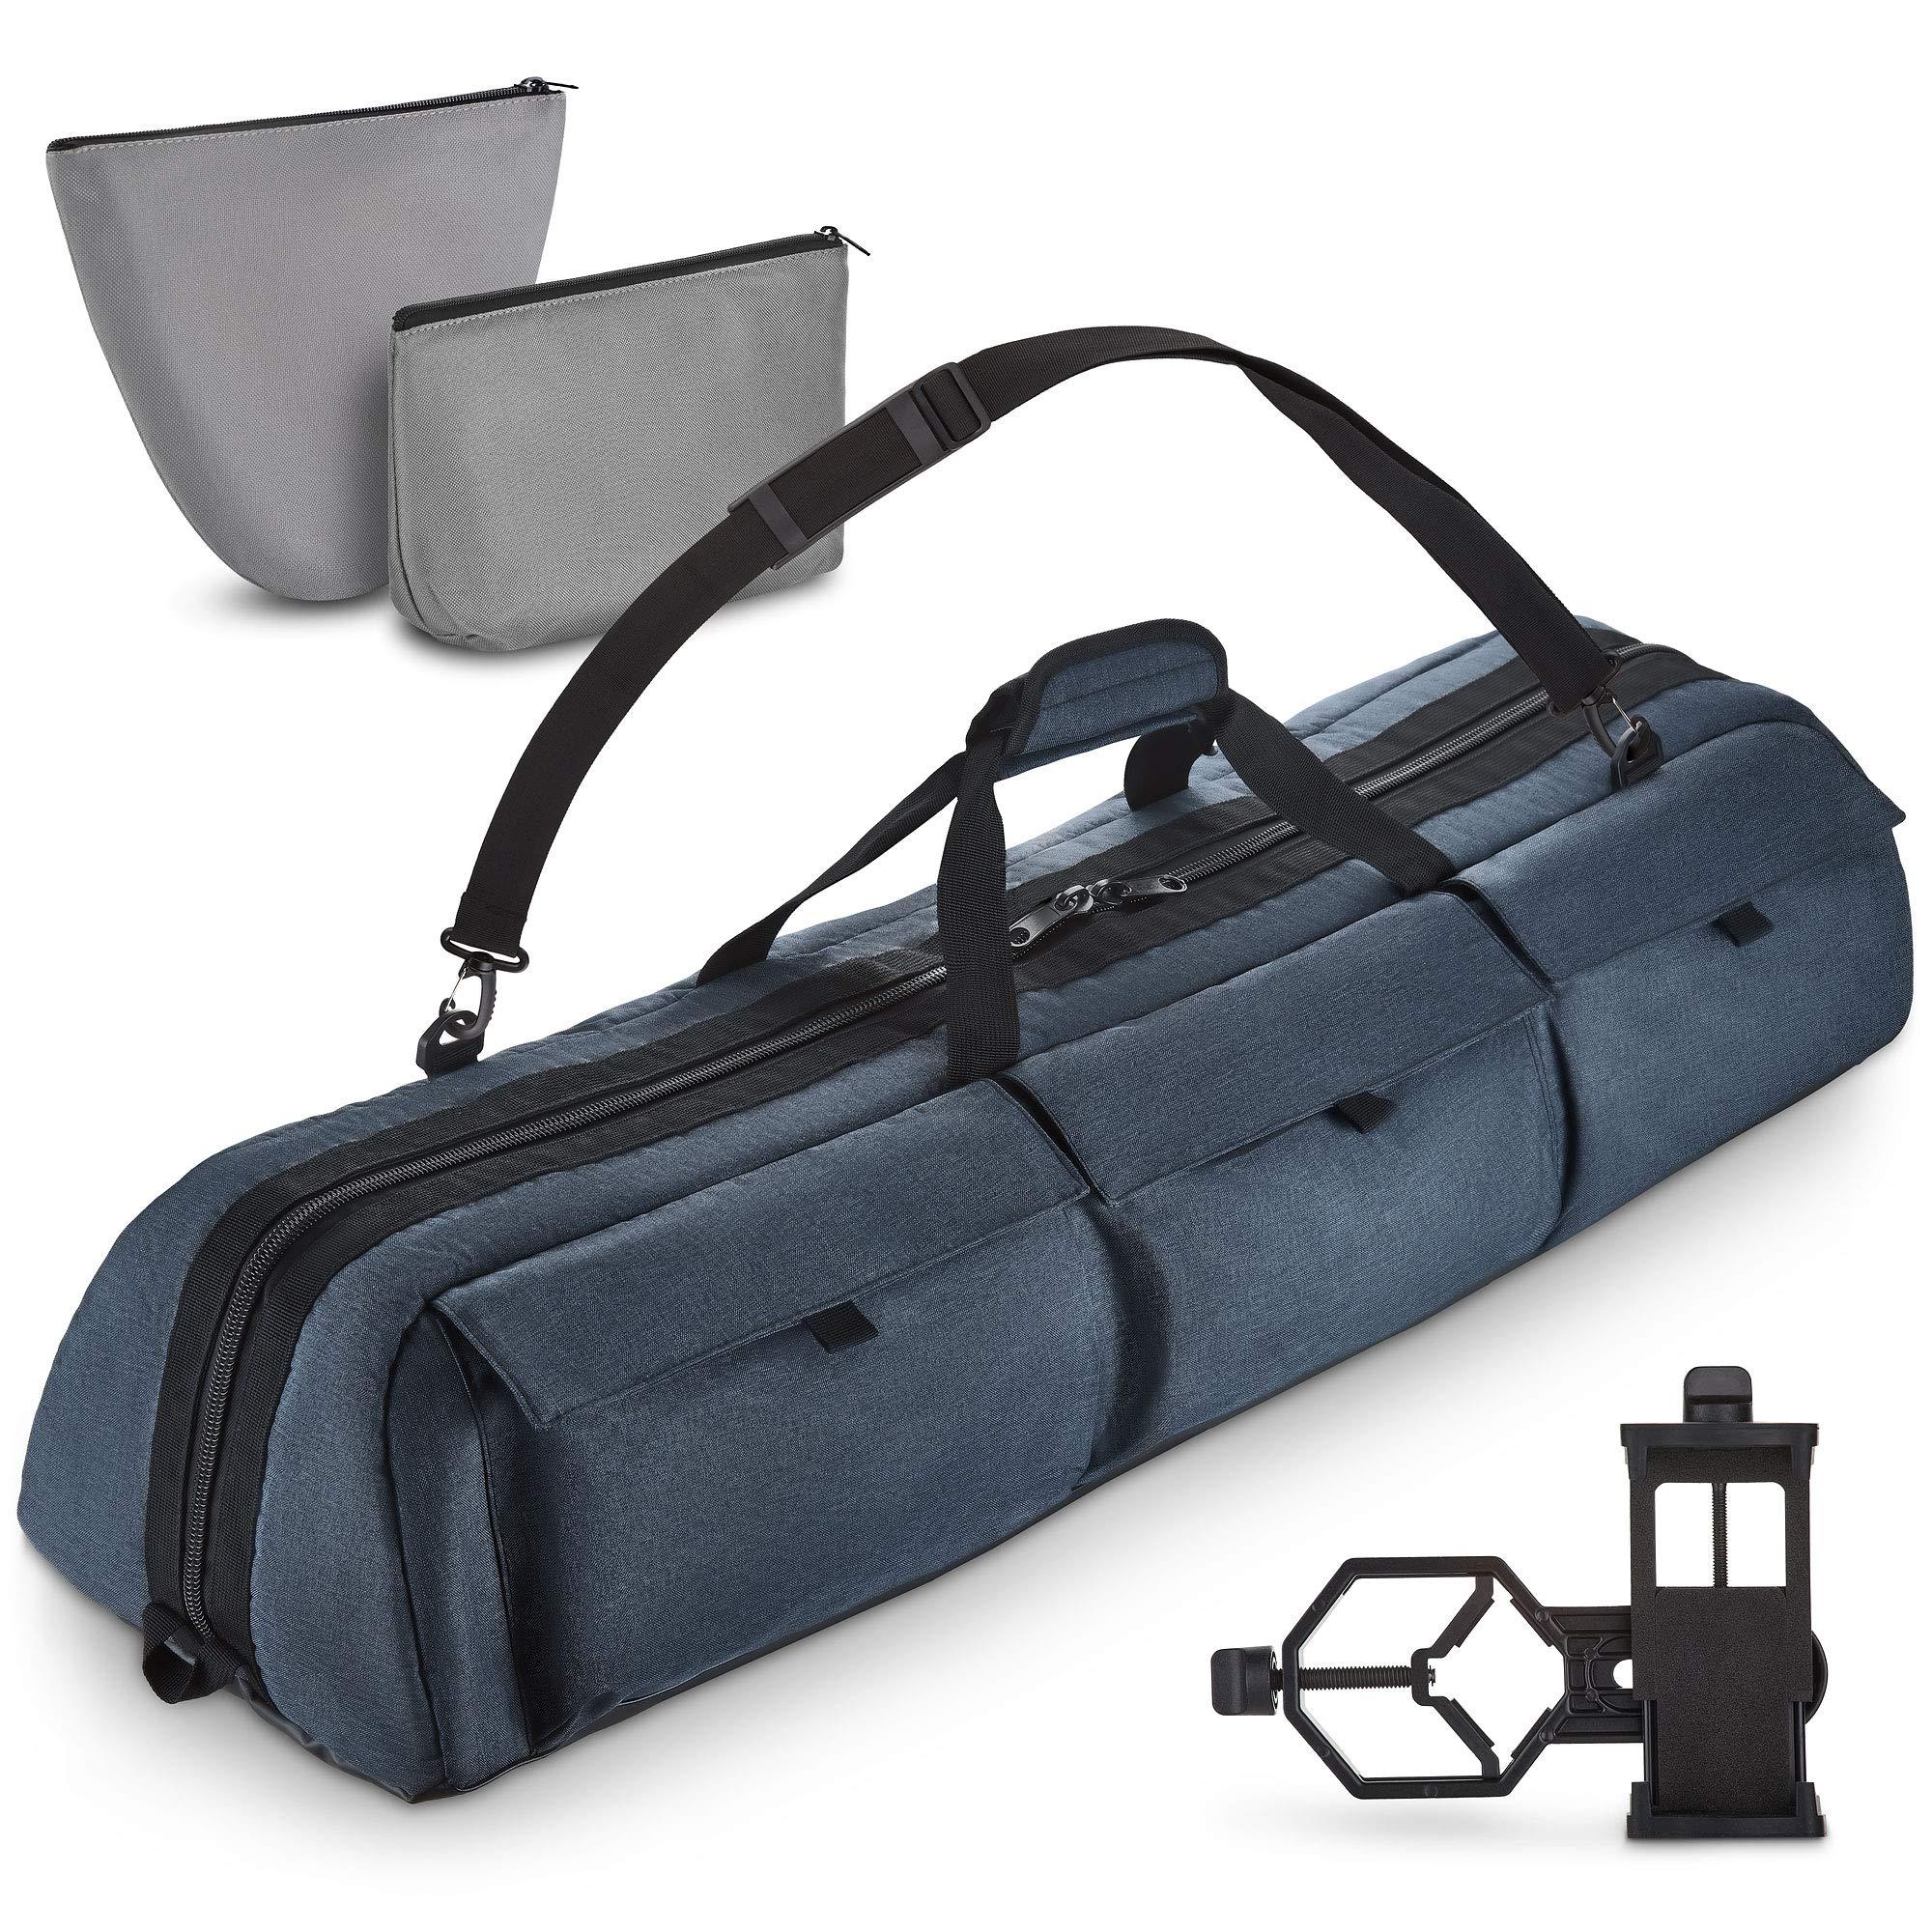 Rhino BagMate Multipurpose Telescope Case - Fits Most Telescopes - 40x10.6x7 inch - Bonus Smart Phone Adapter Included by Rhino BagMate